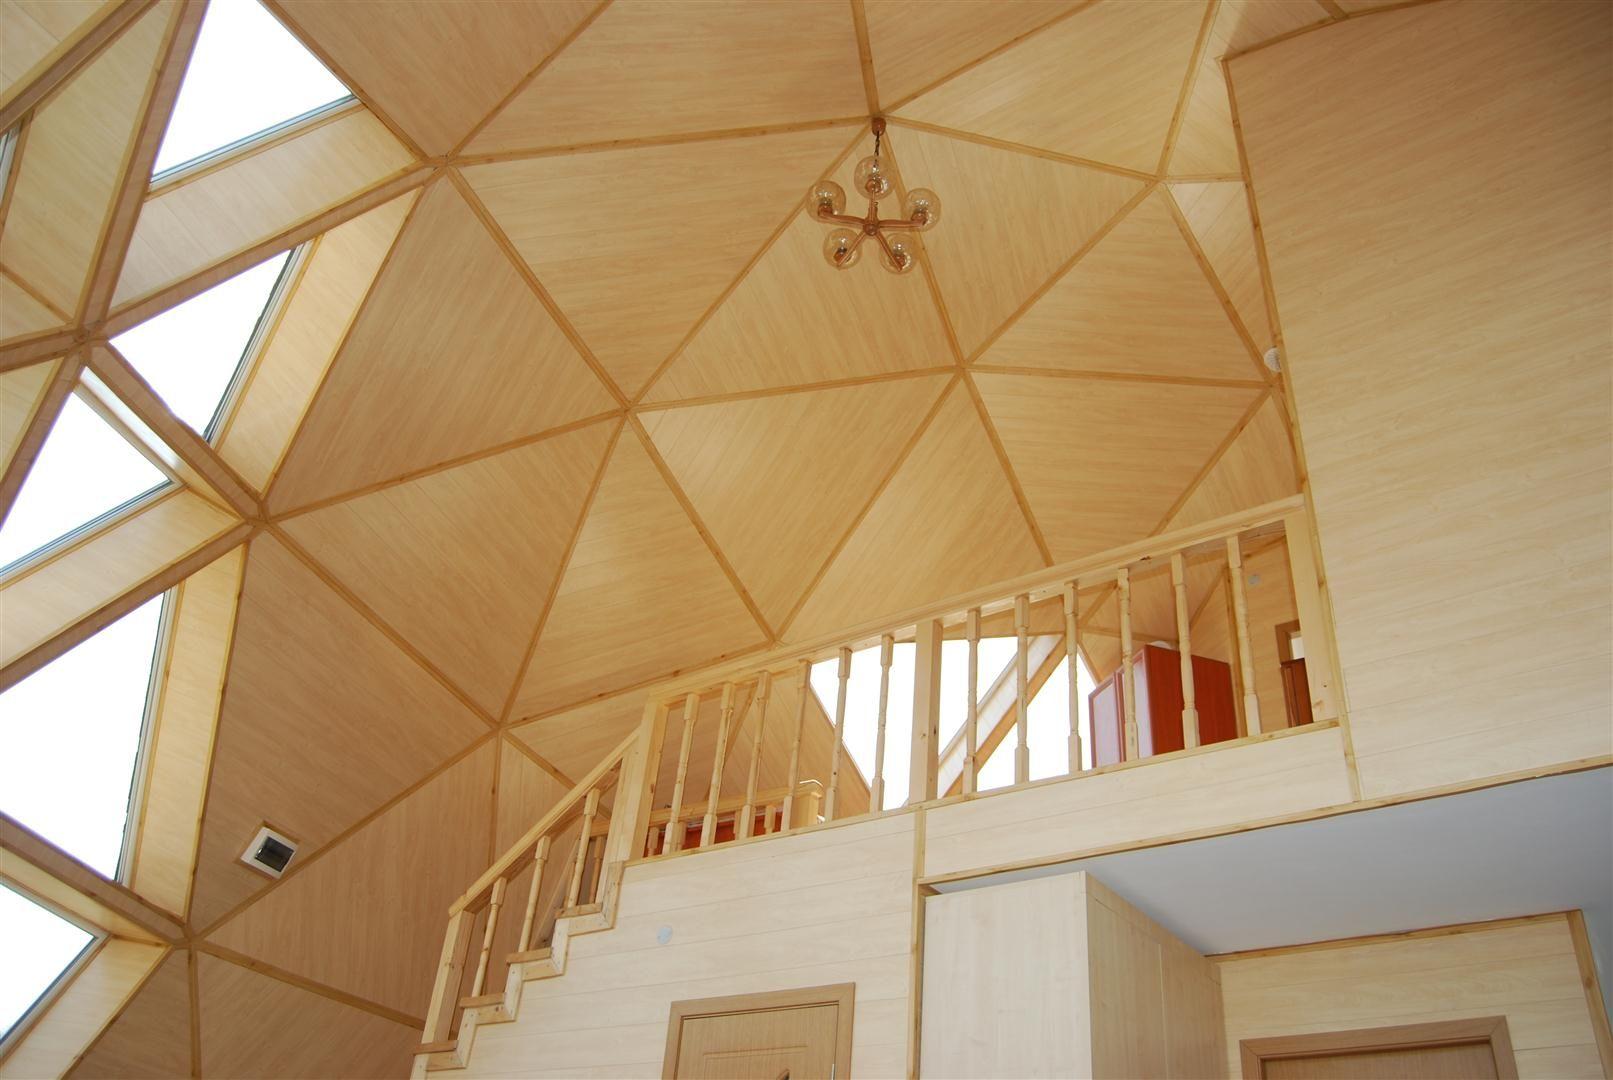 Romanian Dome